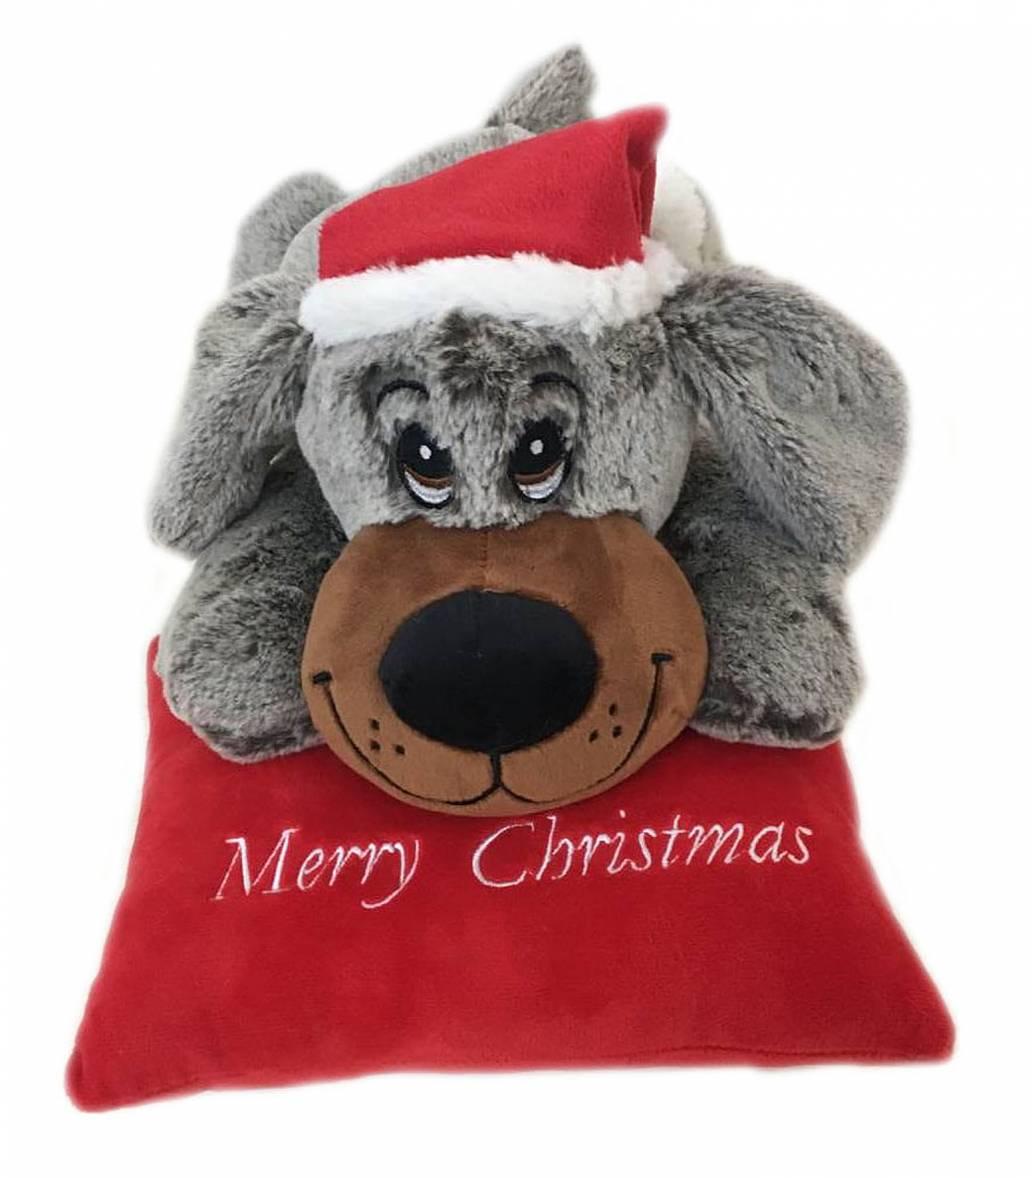 Festive 25cm Grey Laying Dog With Christmas Cushion